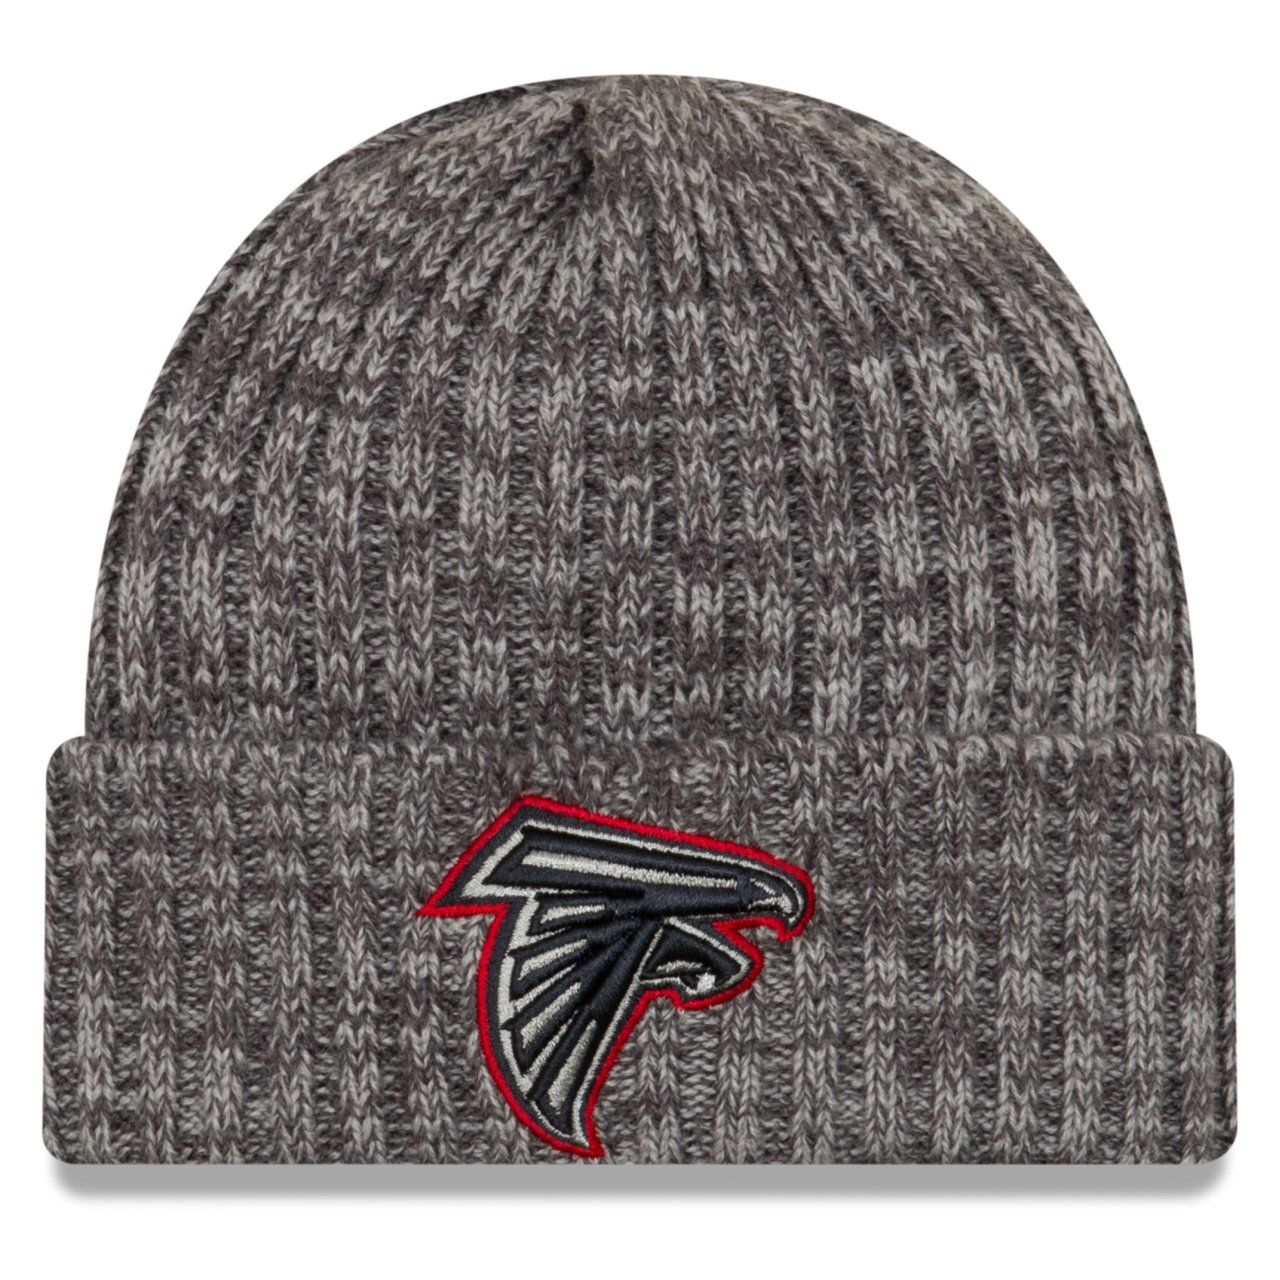 amfoo - New Era NFL Strick Mütze - CRUCIAL CATCH Atlanta Falcons